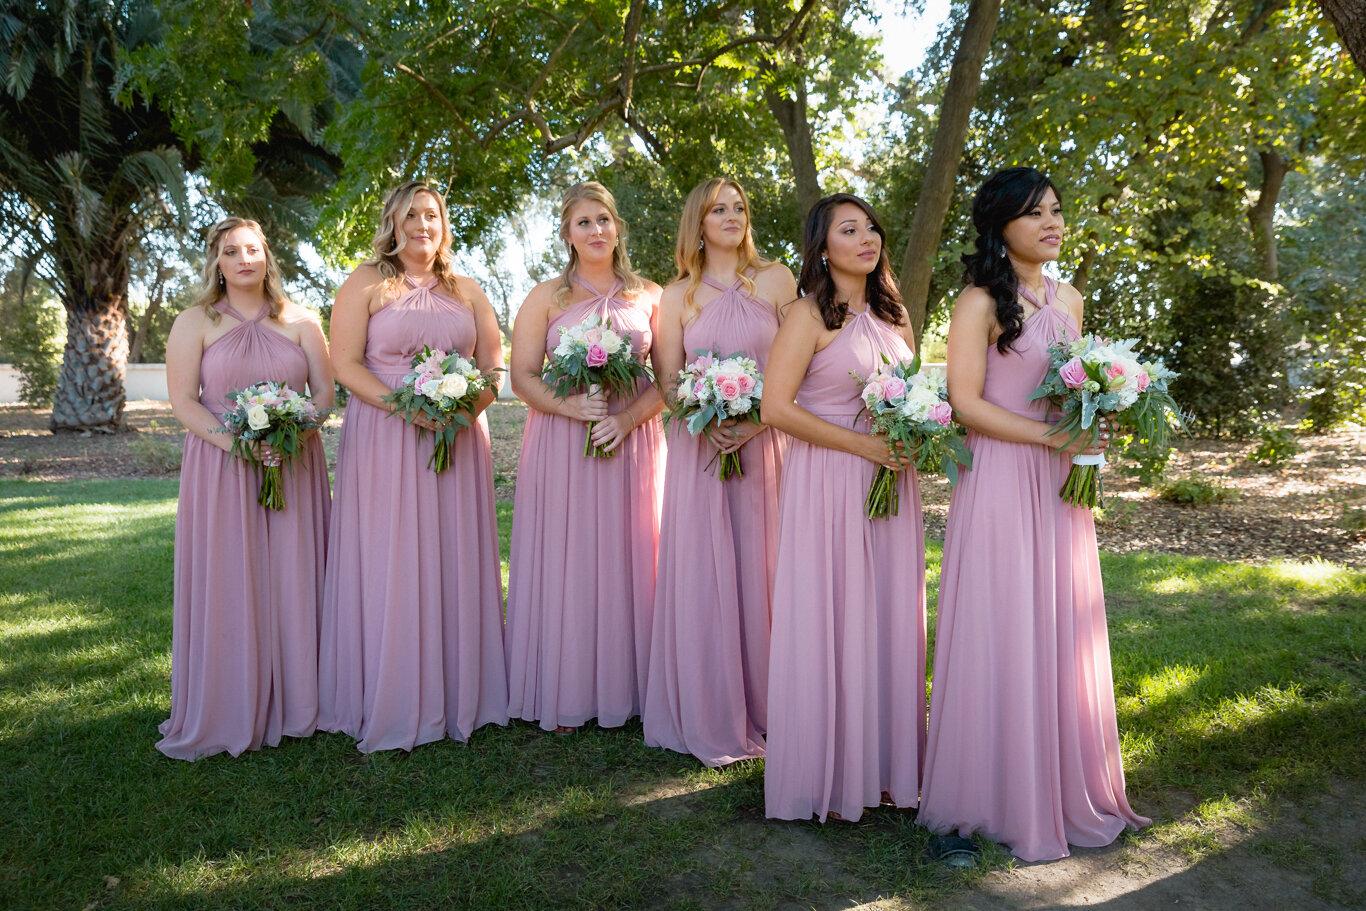 2019.08.24_Emily-Ashir-Wedding-at-the-Maples-5741.jpg